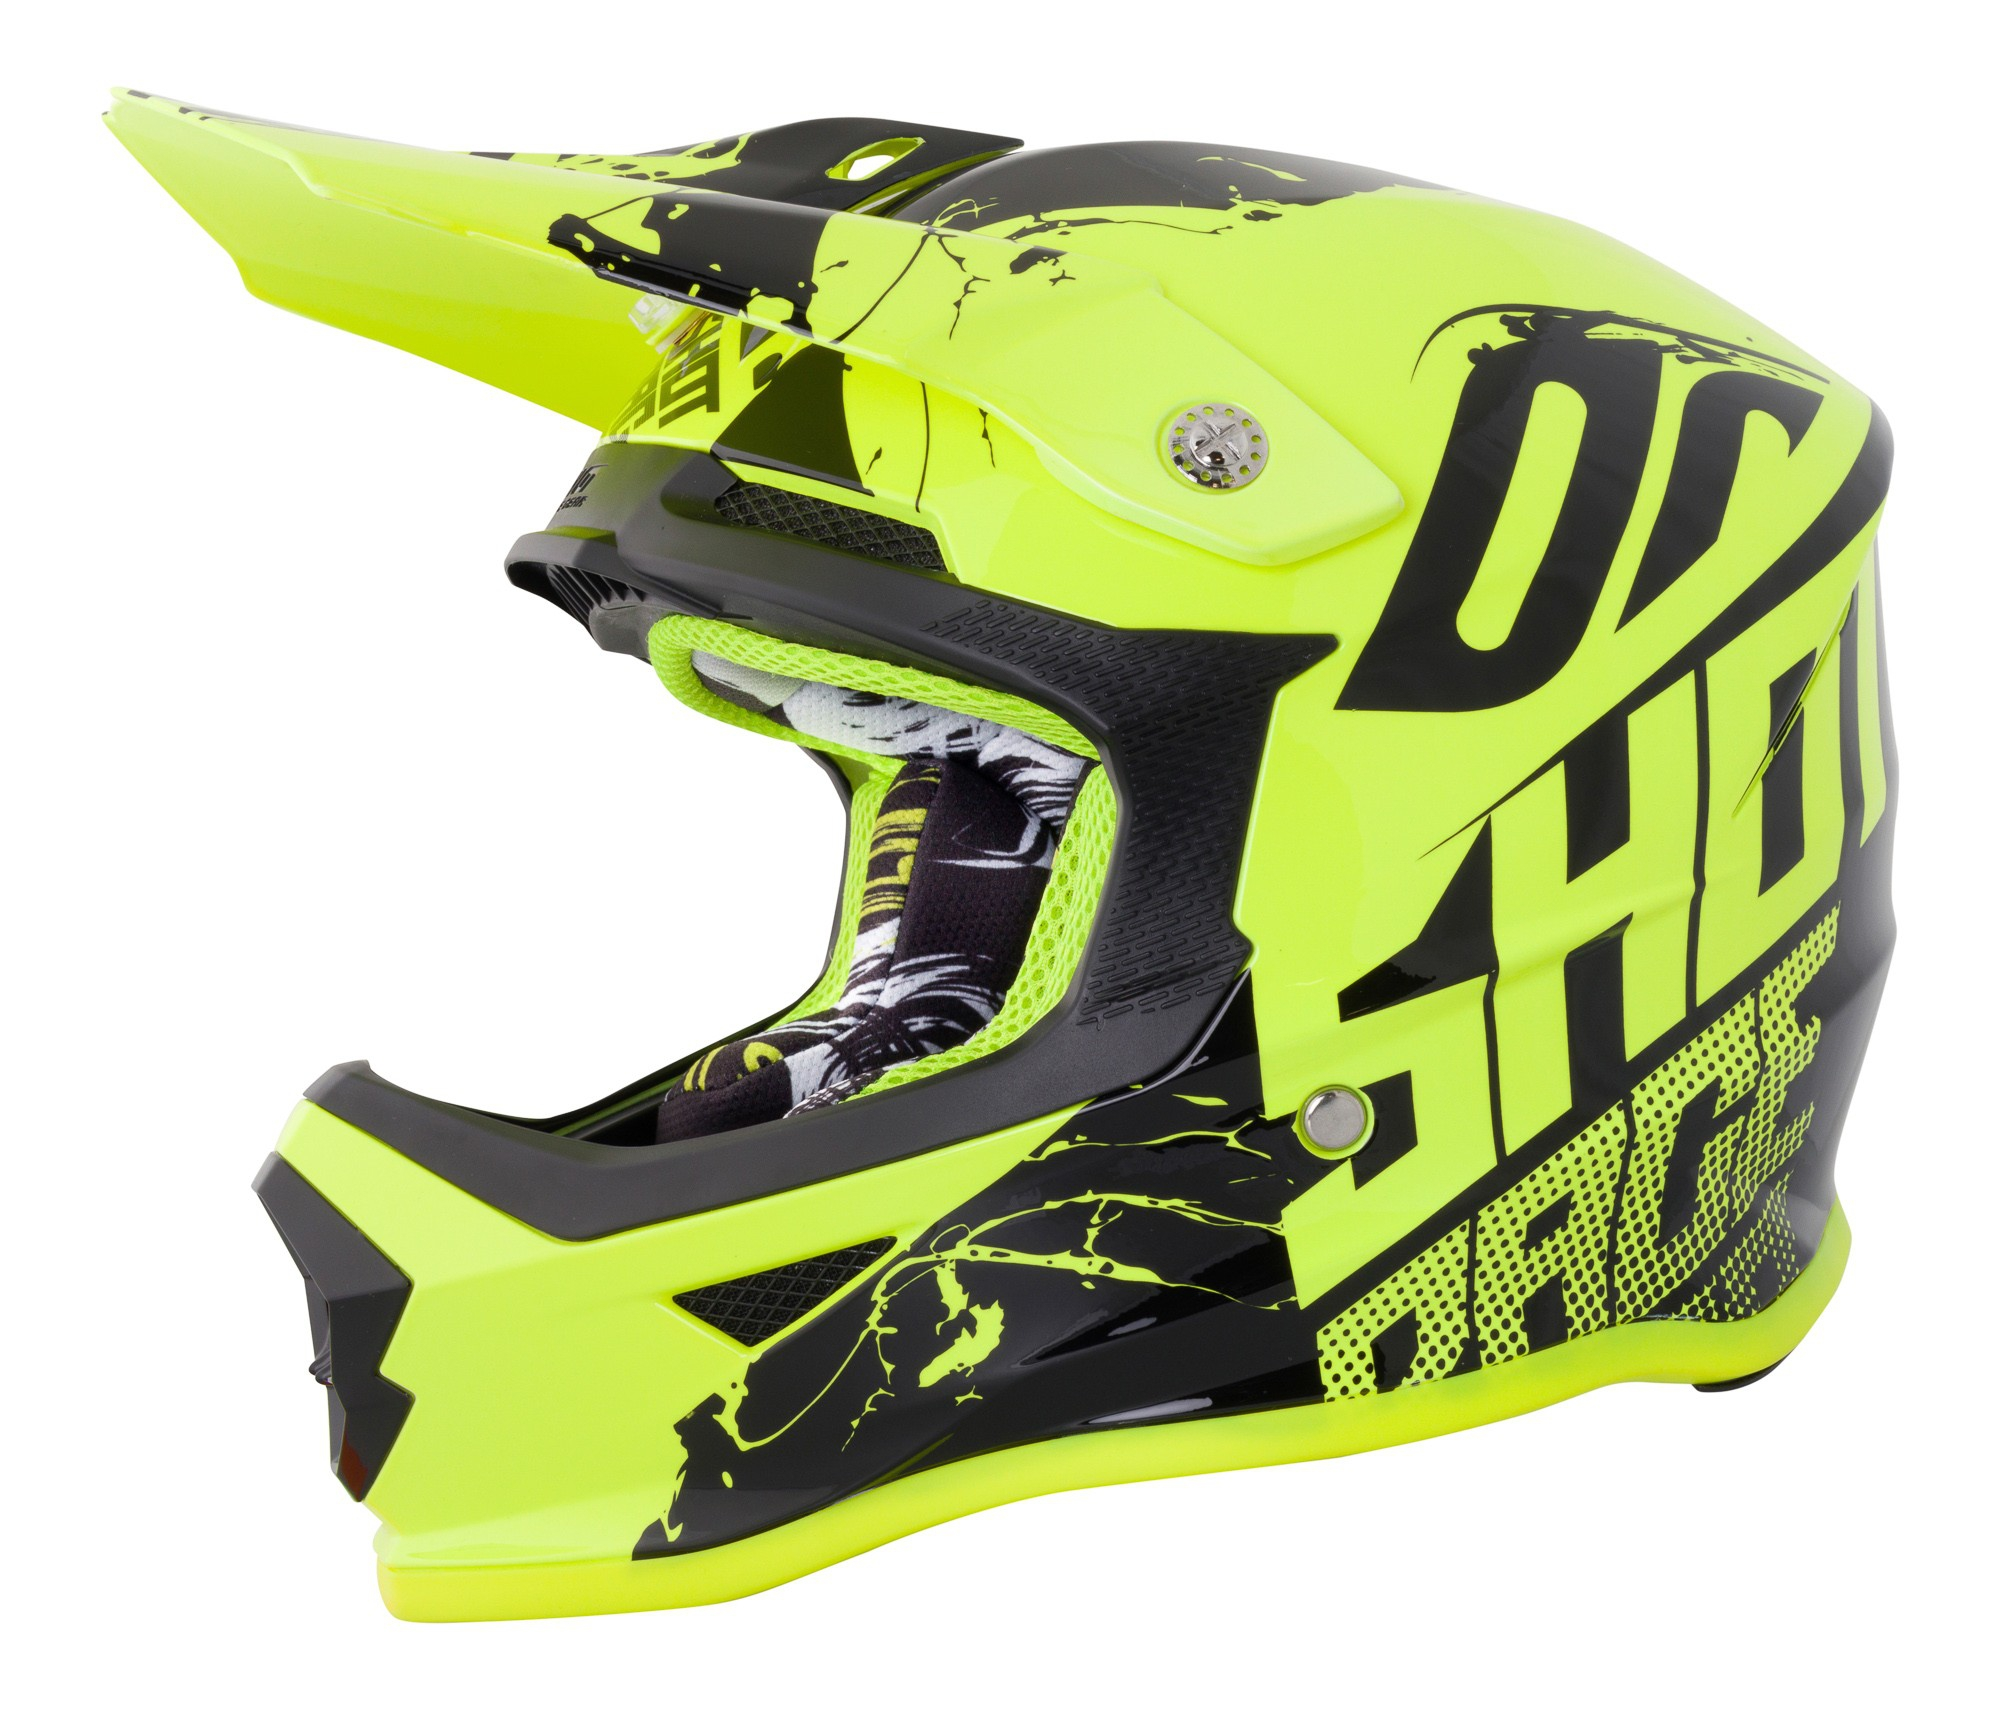 Premium Brand - SHOT Racing